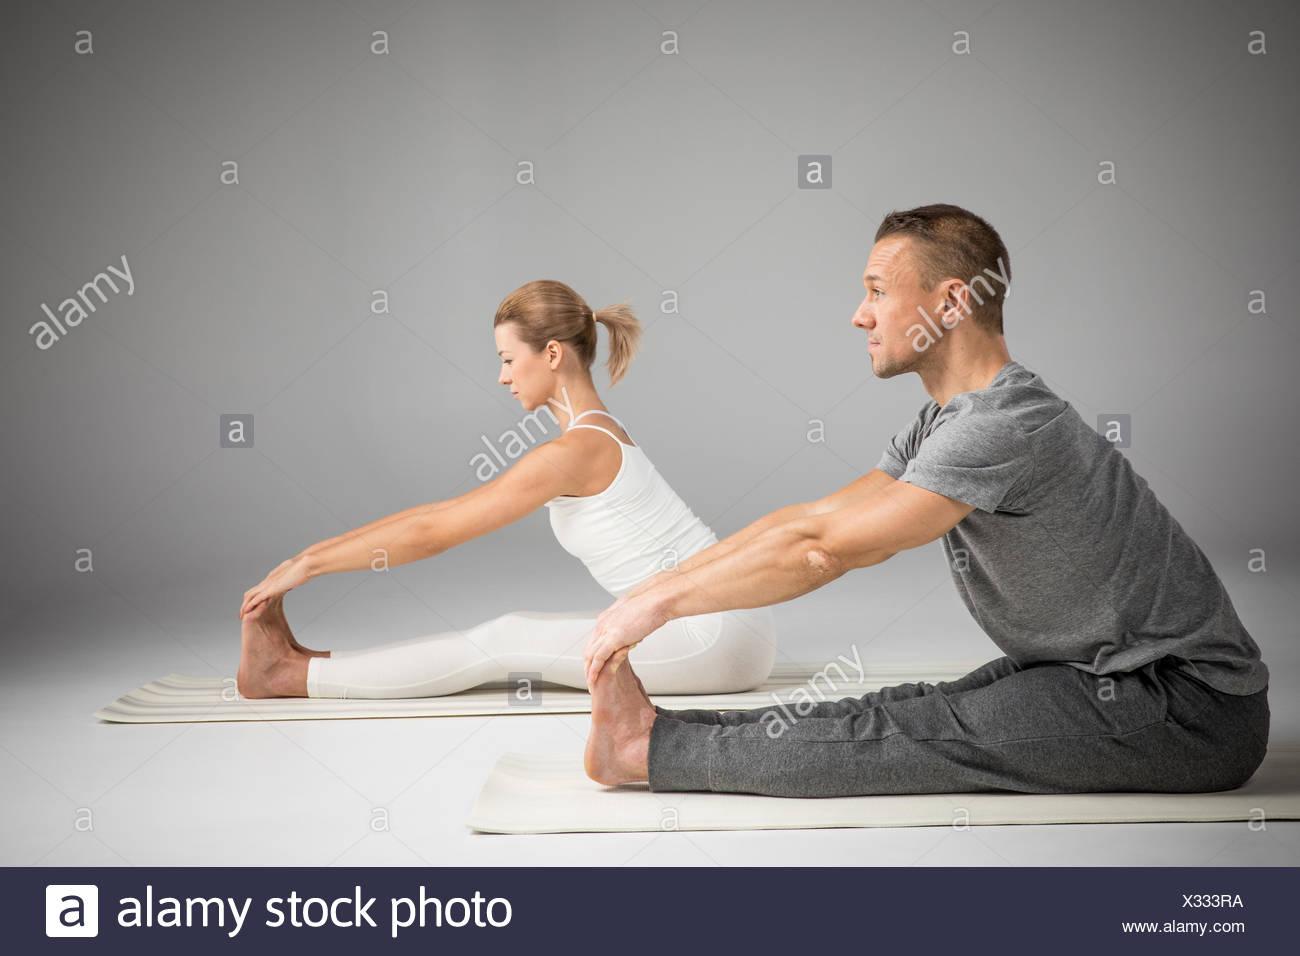 Couple practicing yoga - Stock Image